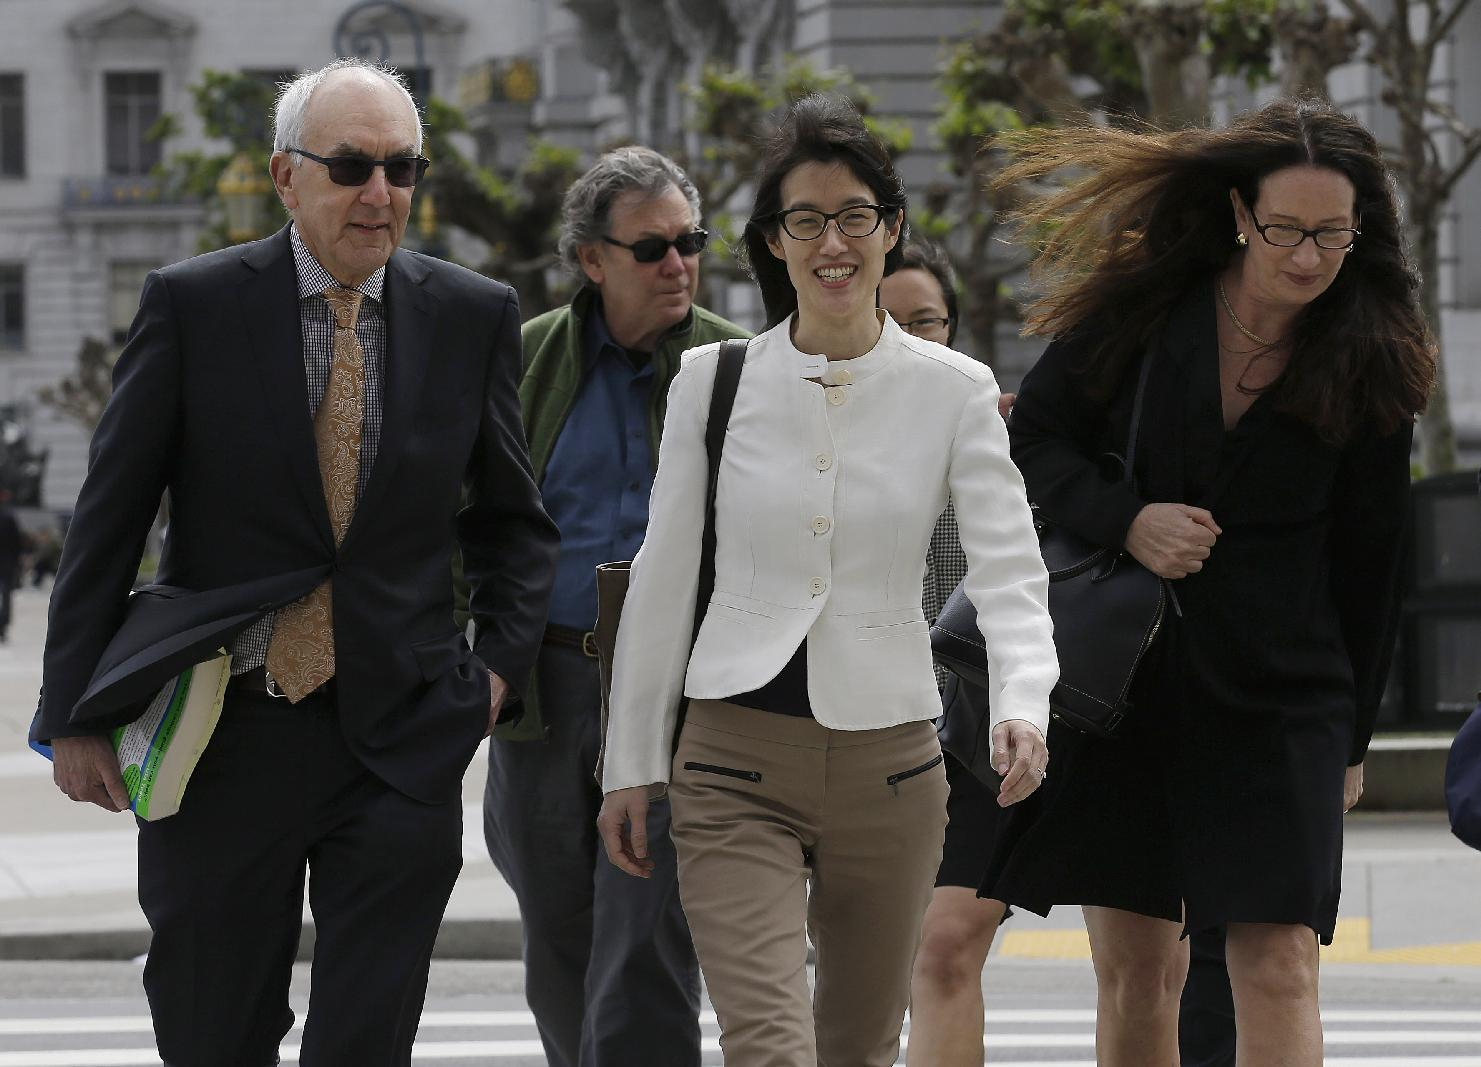 Experts: Sex bias case will embolden women despite verdict